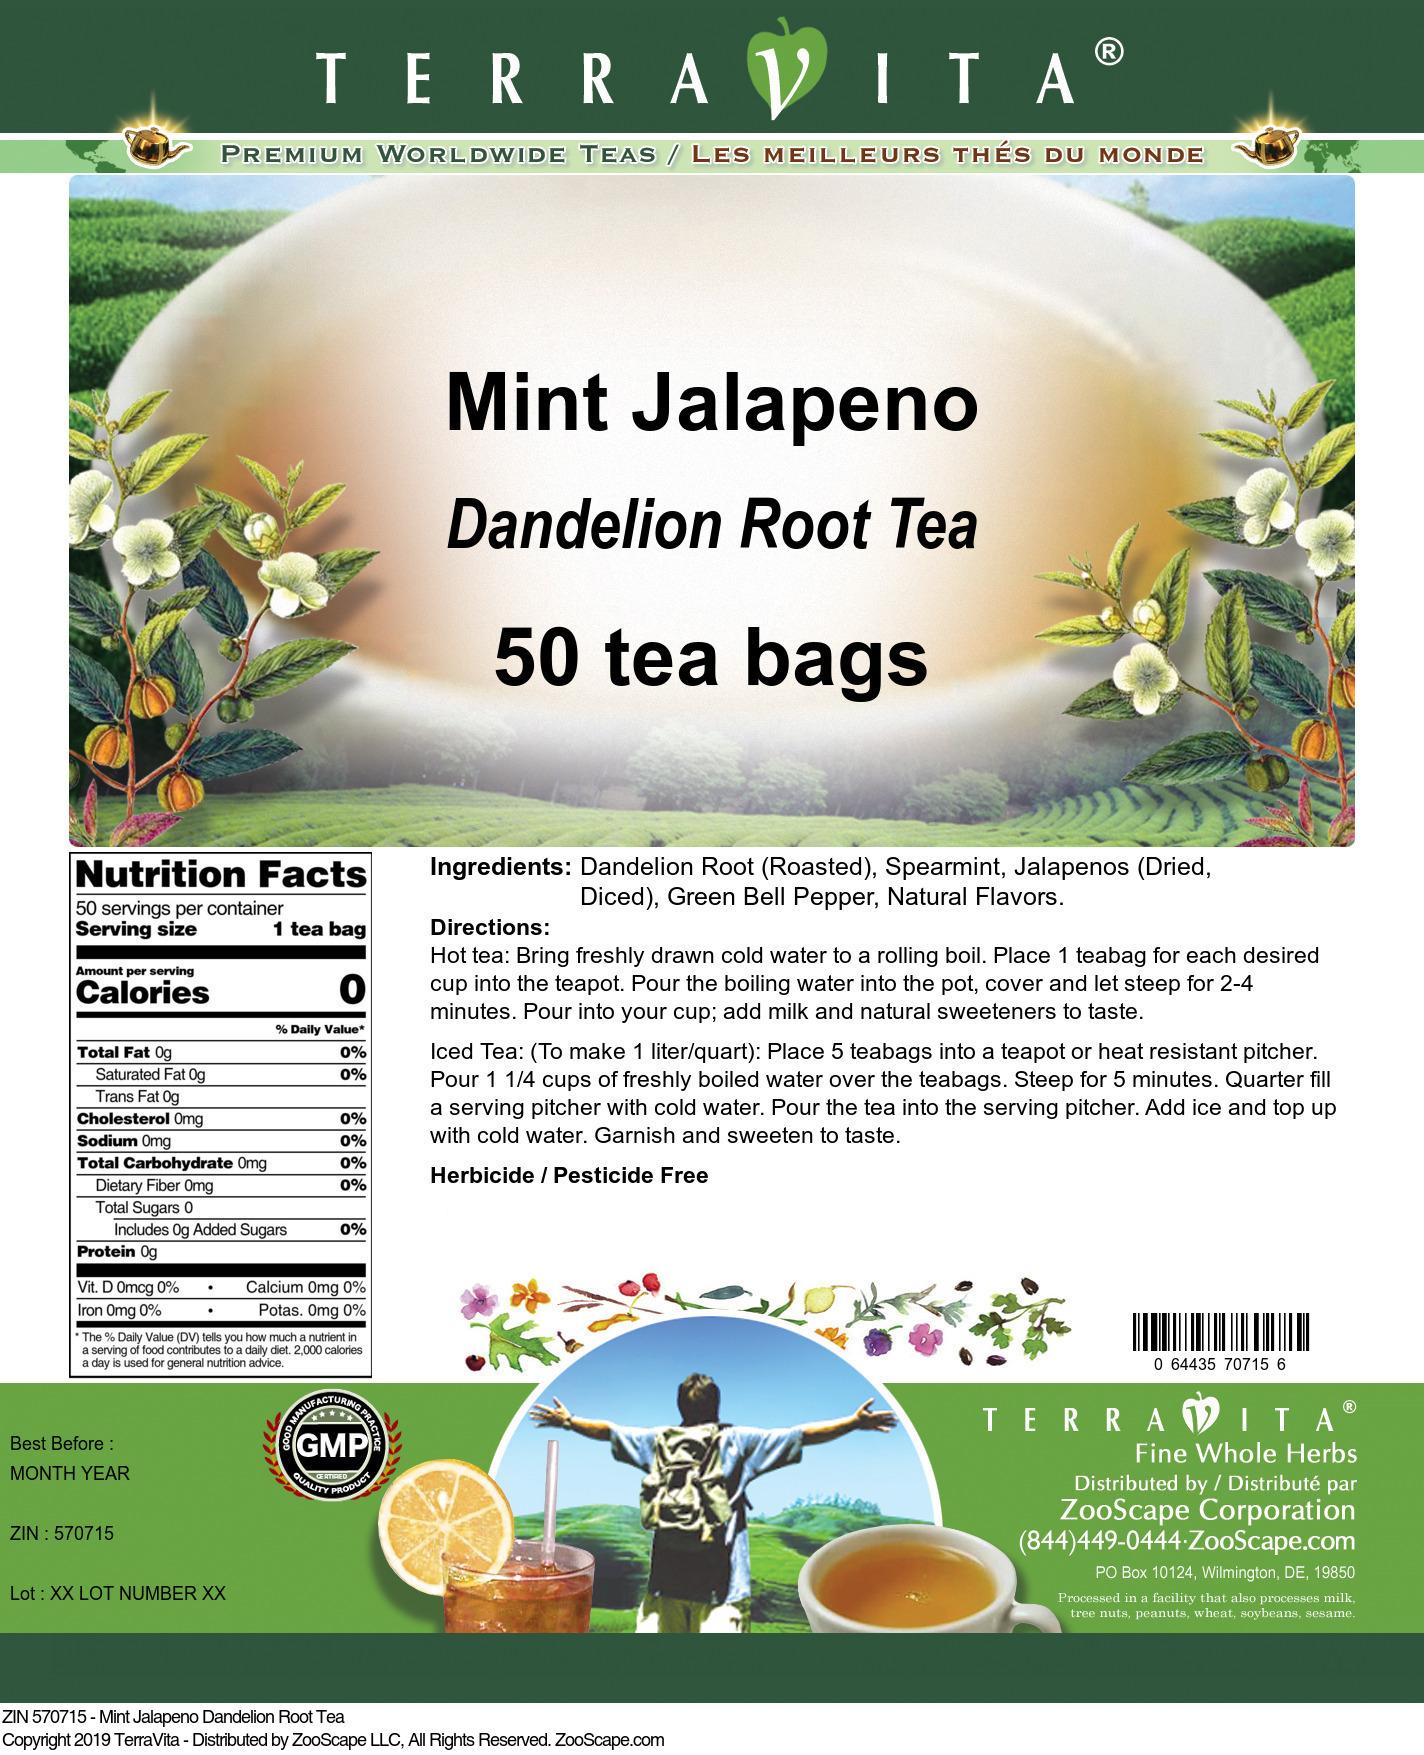 Mint Jalapeno Dandelion Root